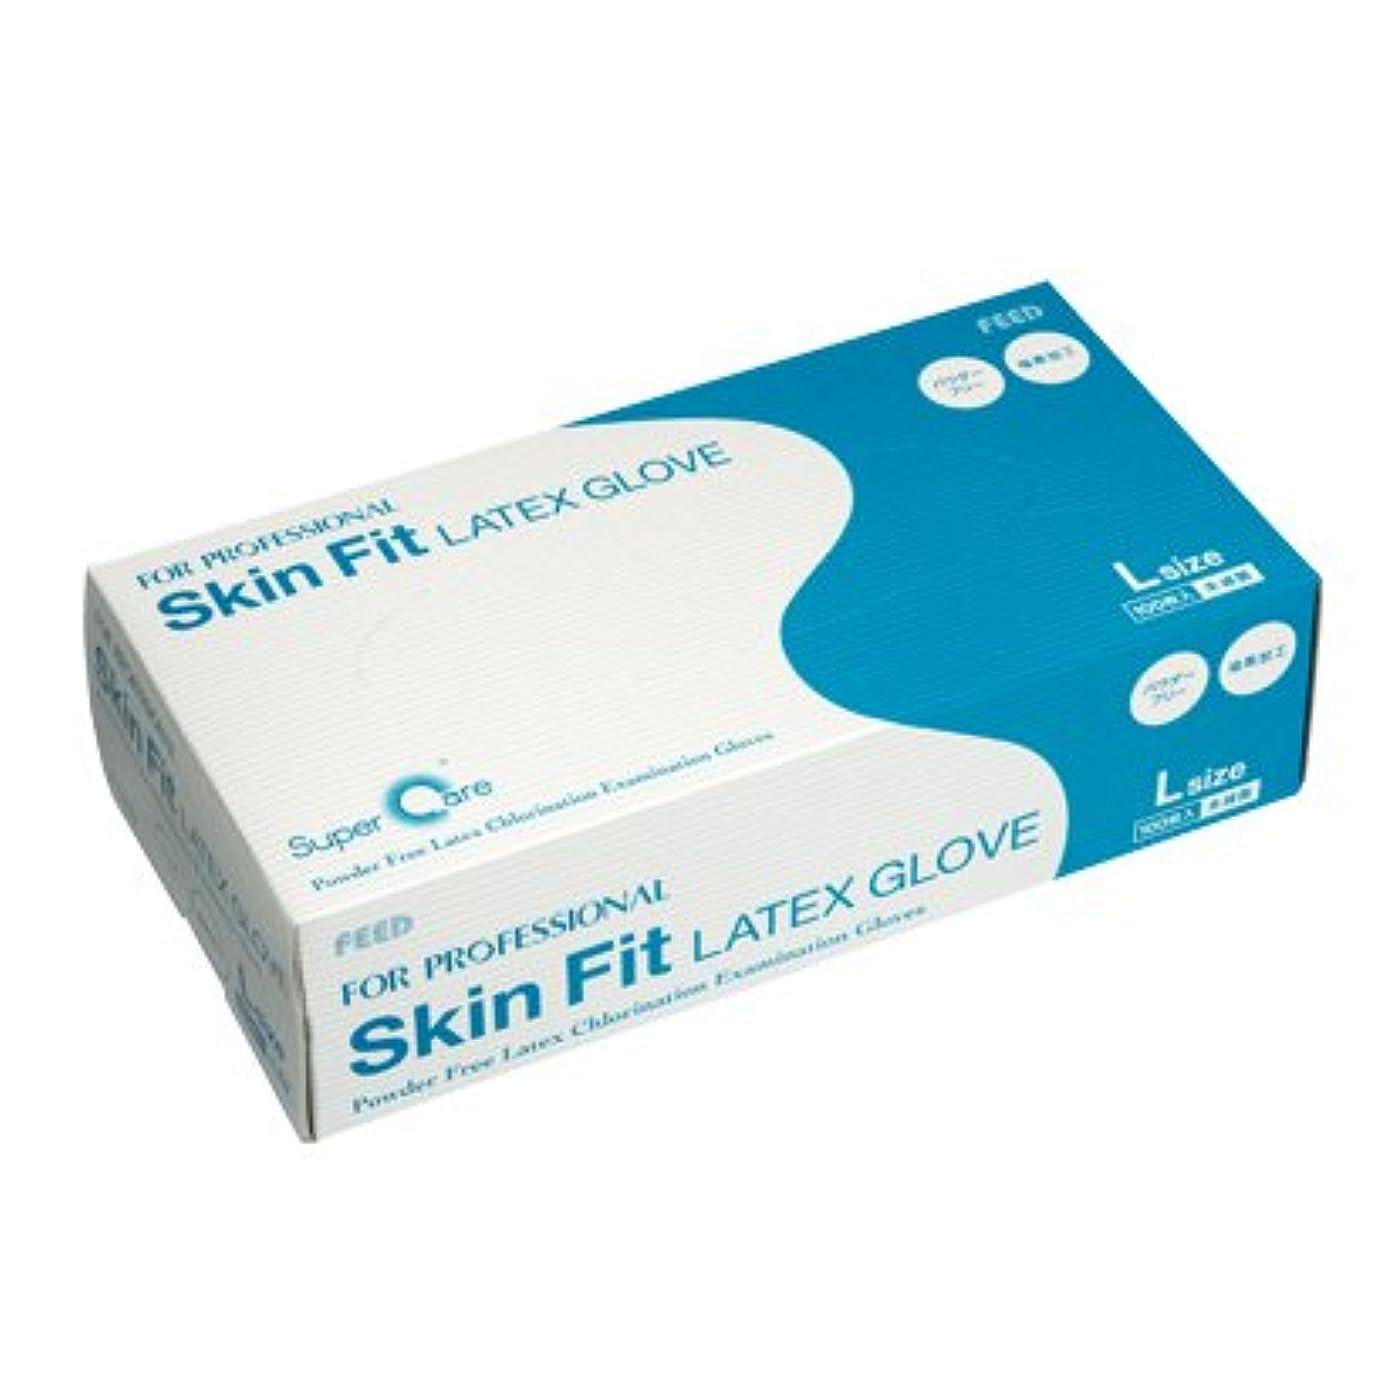 FEED(フィード) Skin Fit ラテックスグローブ パウダーフリー 塩素加工 L カートン(10ケース) (医療機器)